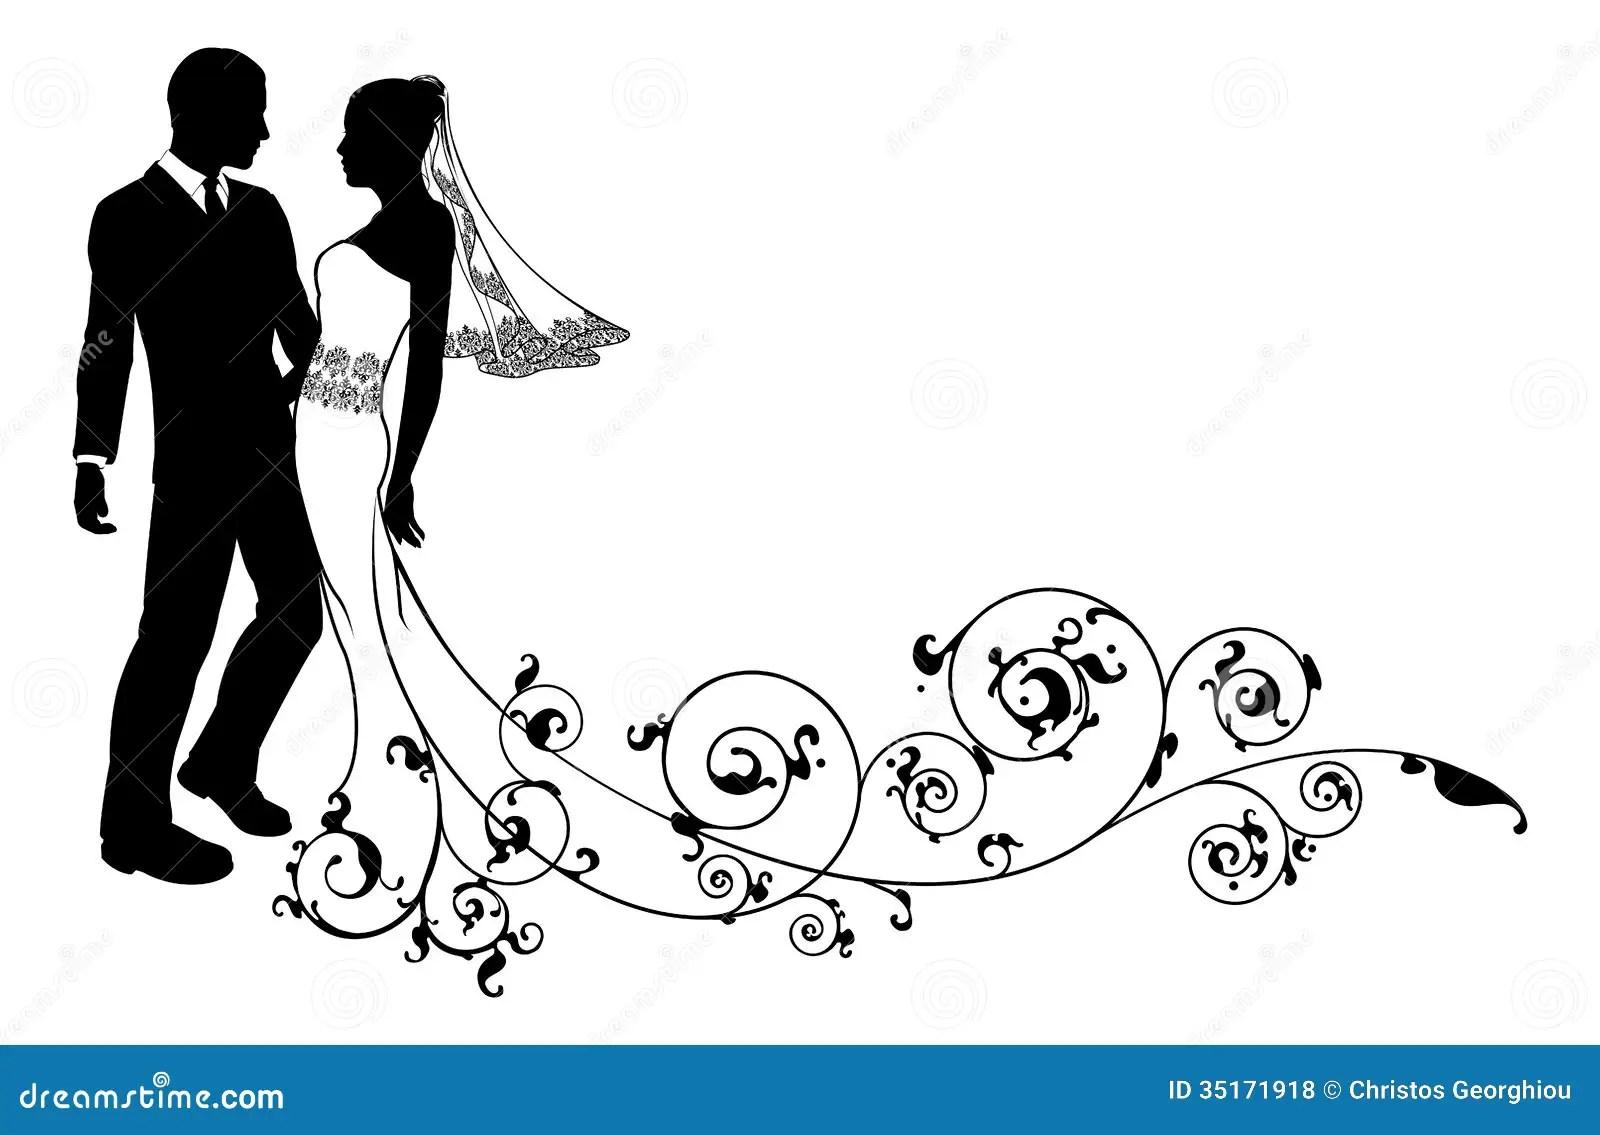 2 way kiss line dance wiring diagram for caravan 13 pin plug wedding couple bride and groom silhouette stock vector